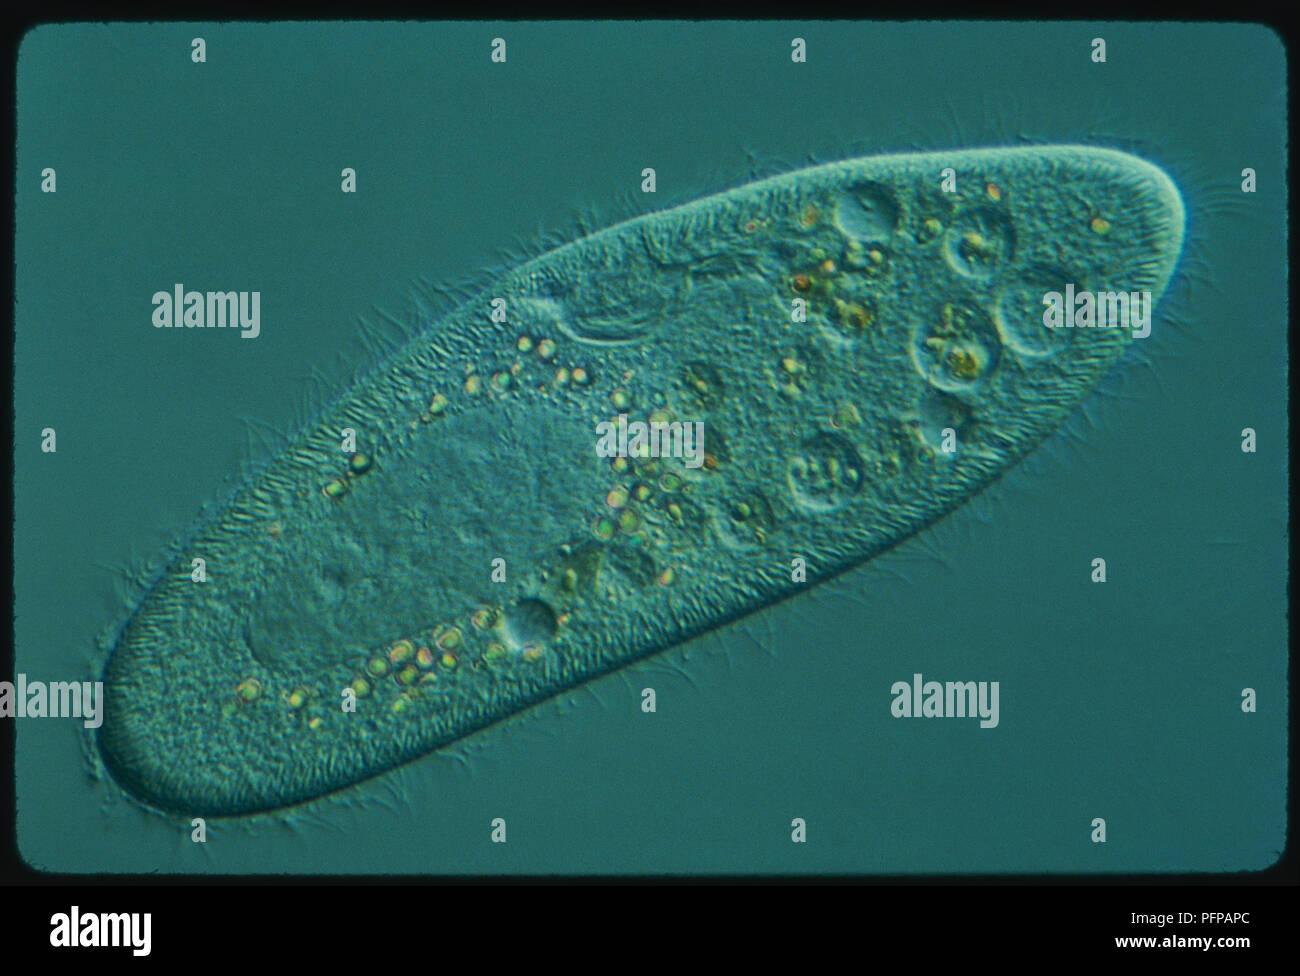 Single Celled Organism Cyclops